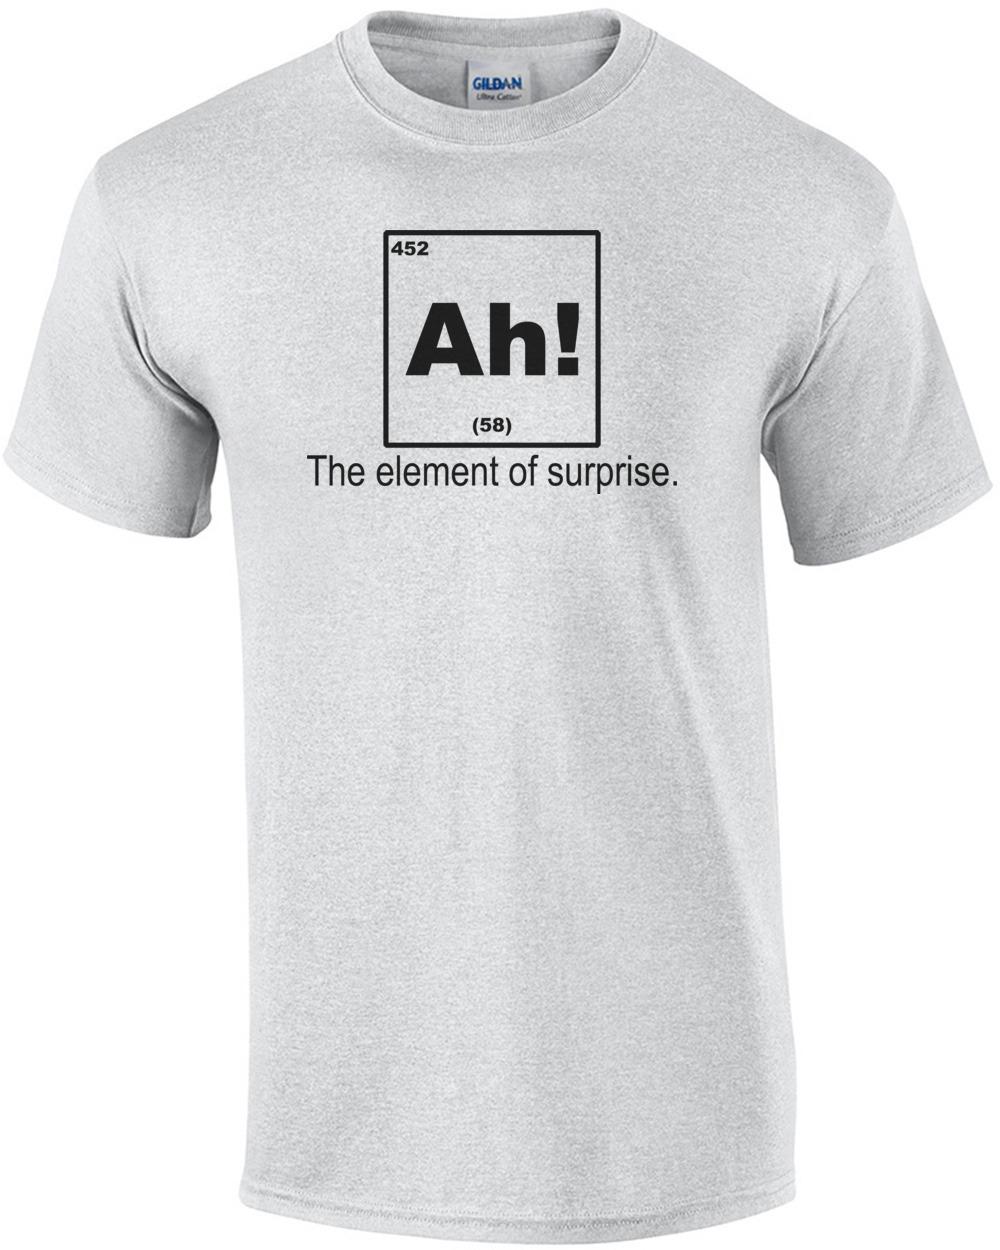 def27efb5fa63e ah-the-element-of-surprise-funny-shirt-mens-regular-ash.jpg